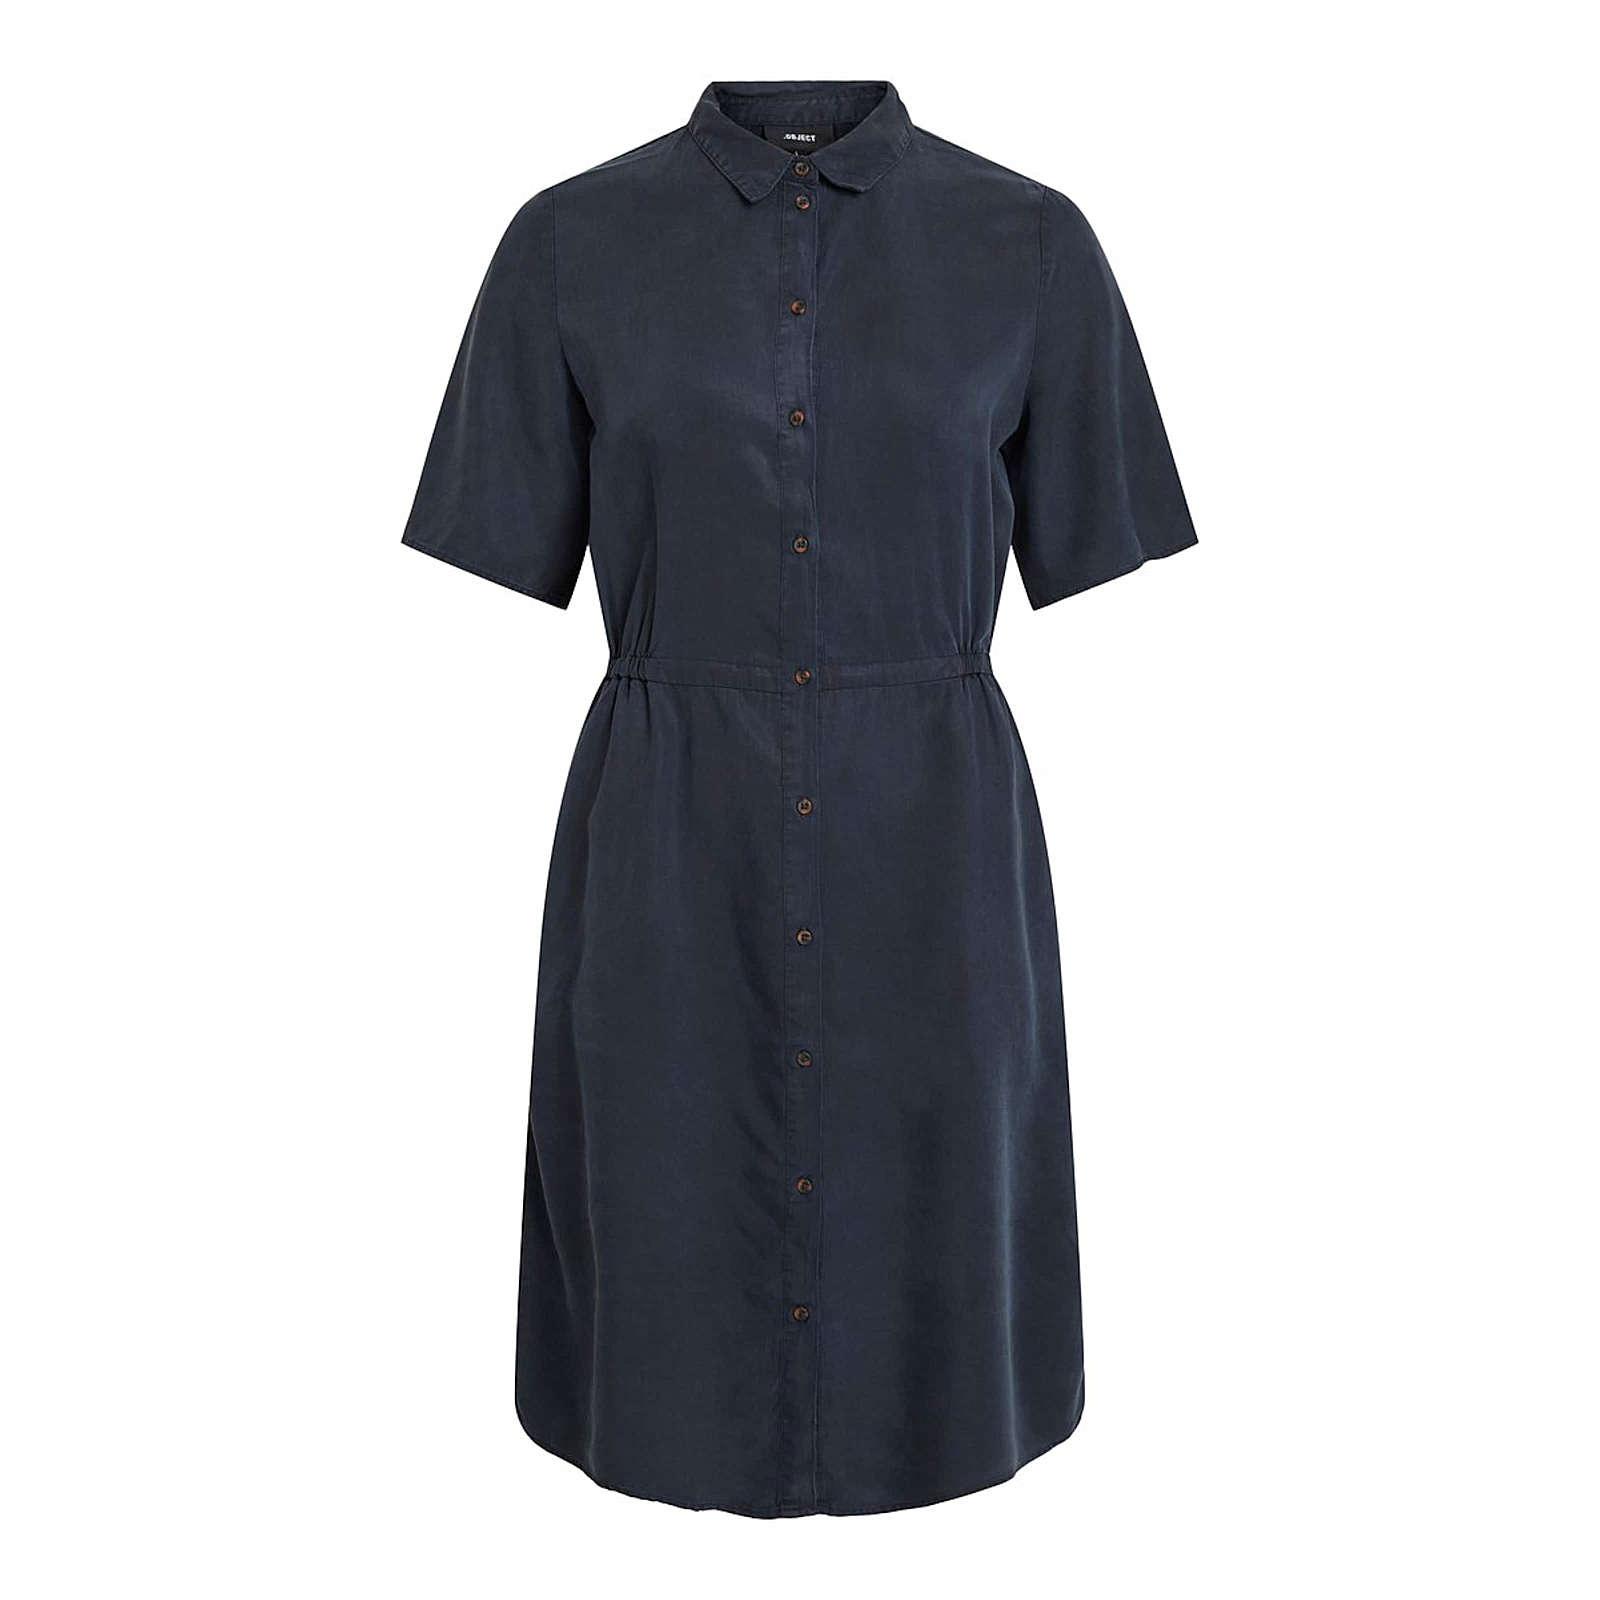 OBJECT Blusenkleid Blusenkleider blau Damen Gr. 34